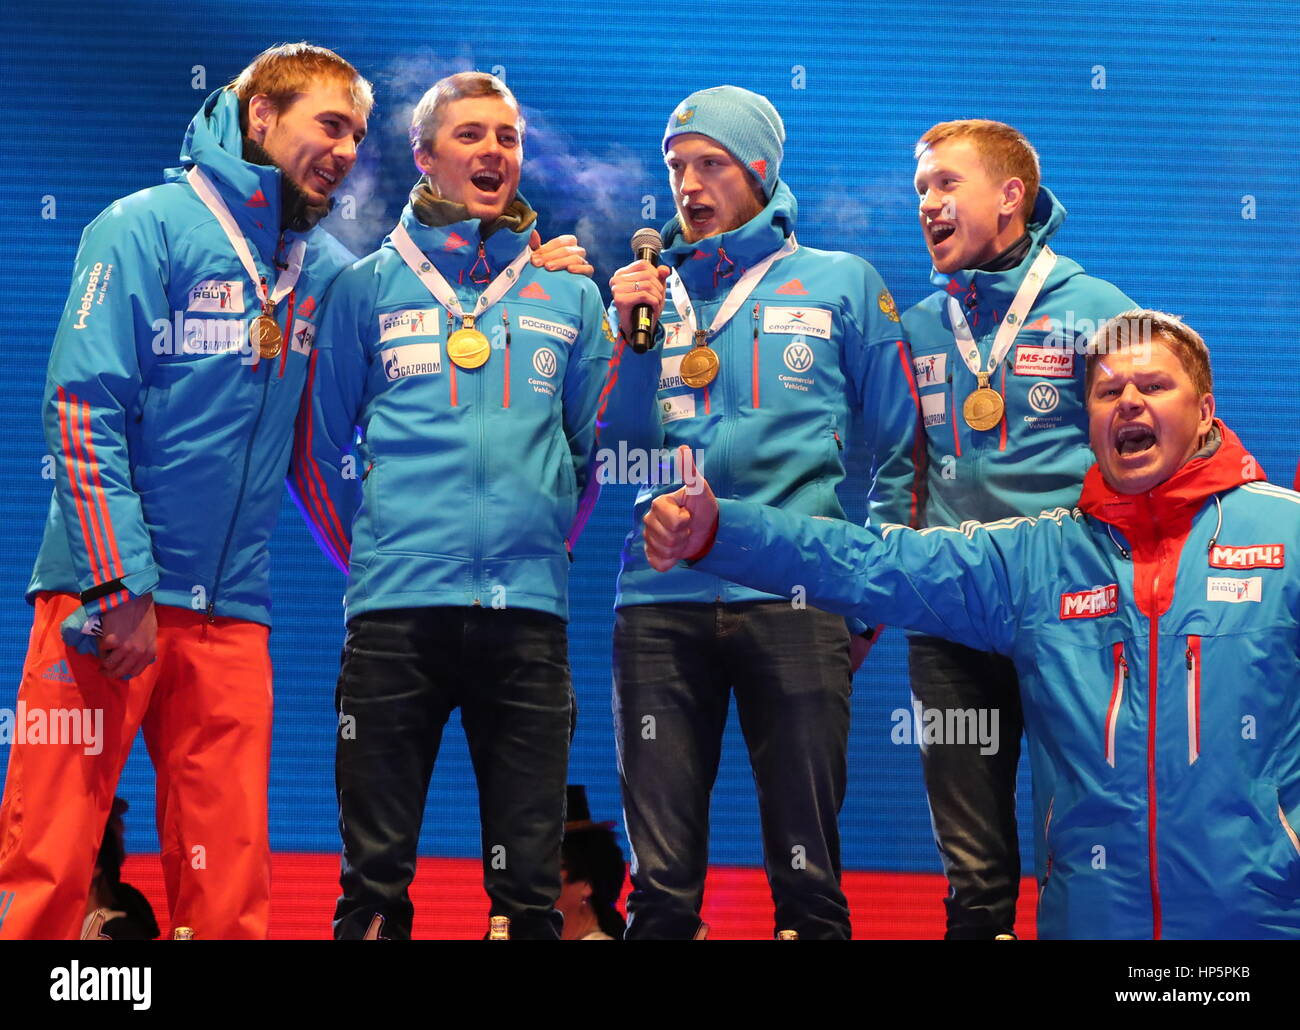 Hochfilzen, Austria. 18th Feb, 2017. Russian TV commentator Dmitry Guberniyev (front) helps gold medallists Anton - Stock Image